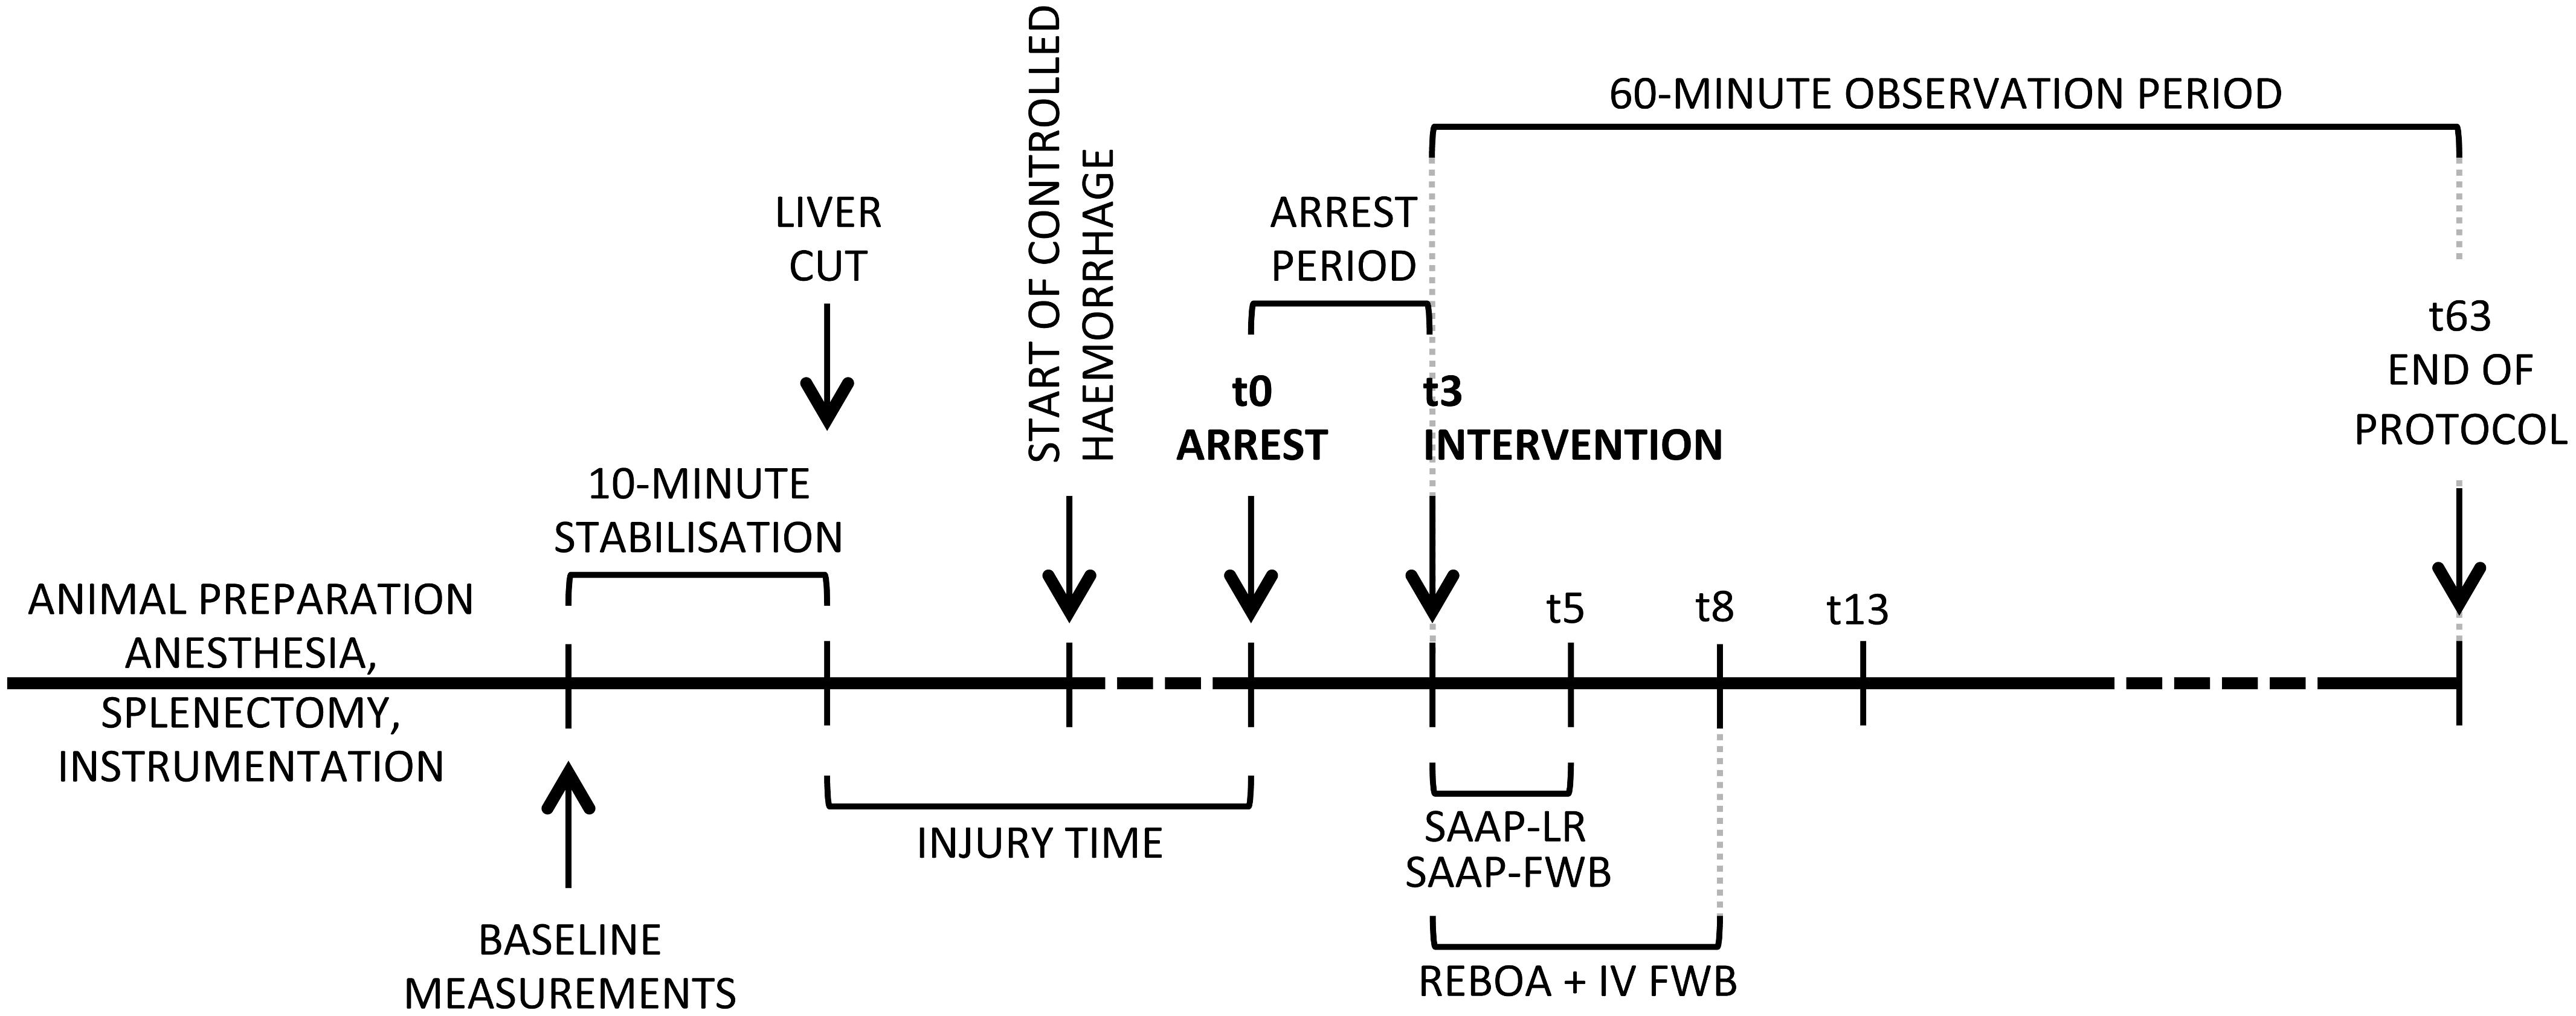 Protocol timeline.